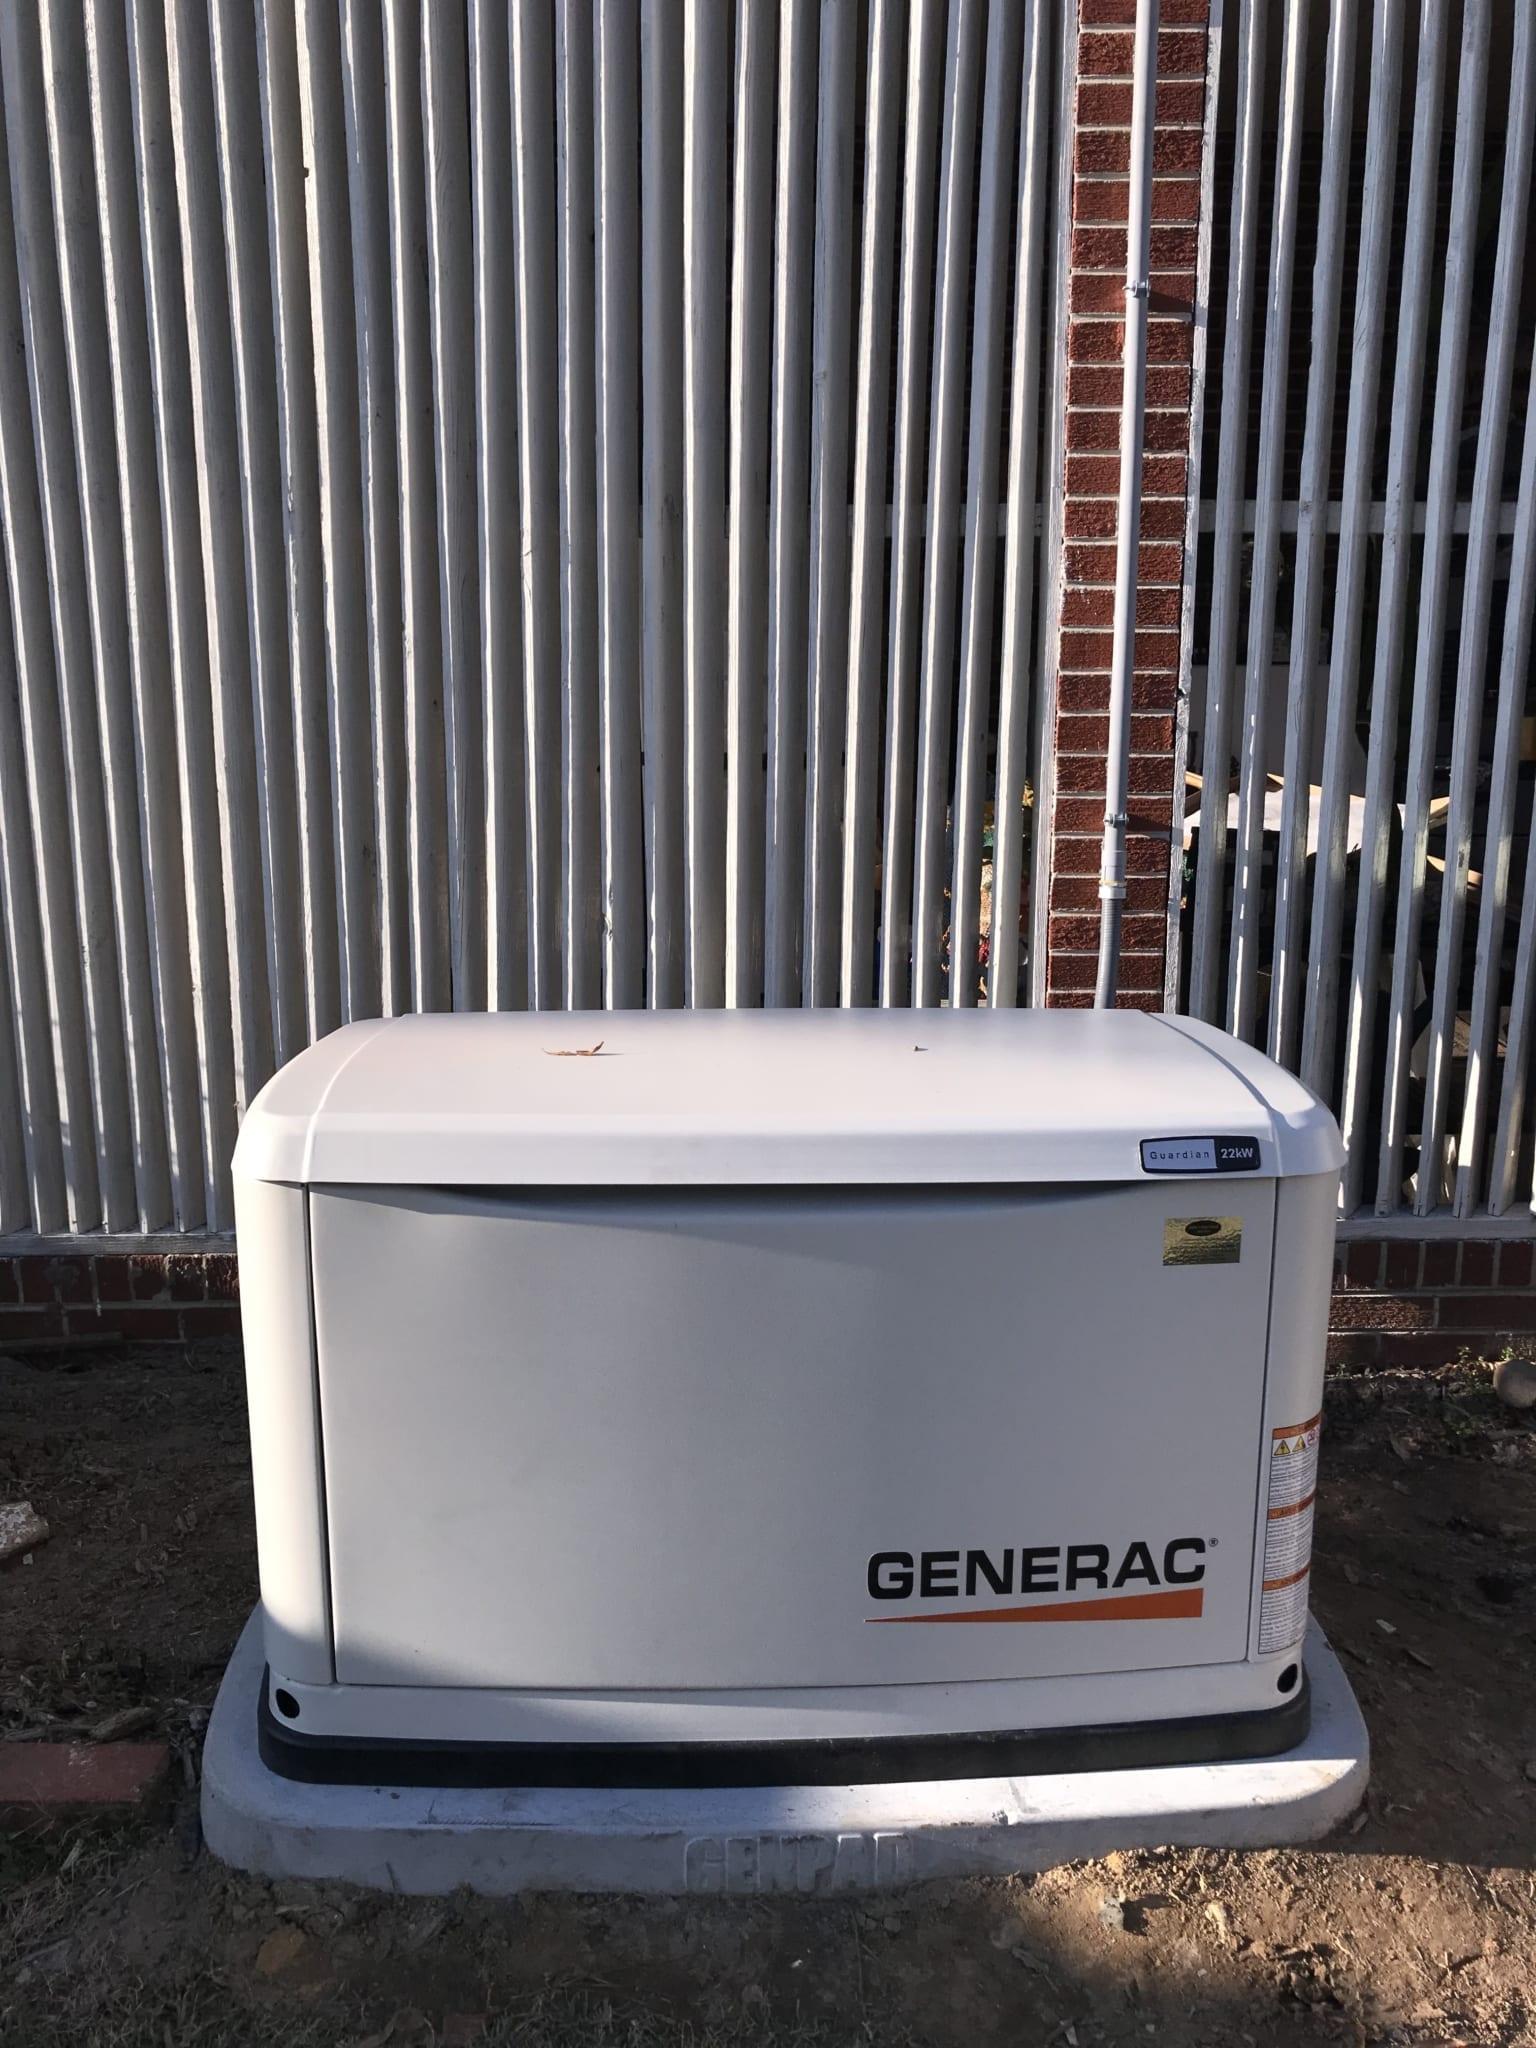 12.4.19 Emporia Generac Automatic Standby Generator